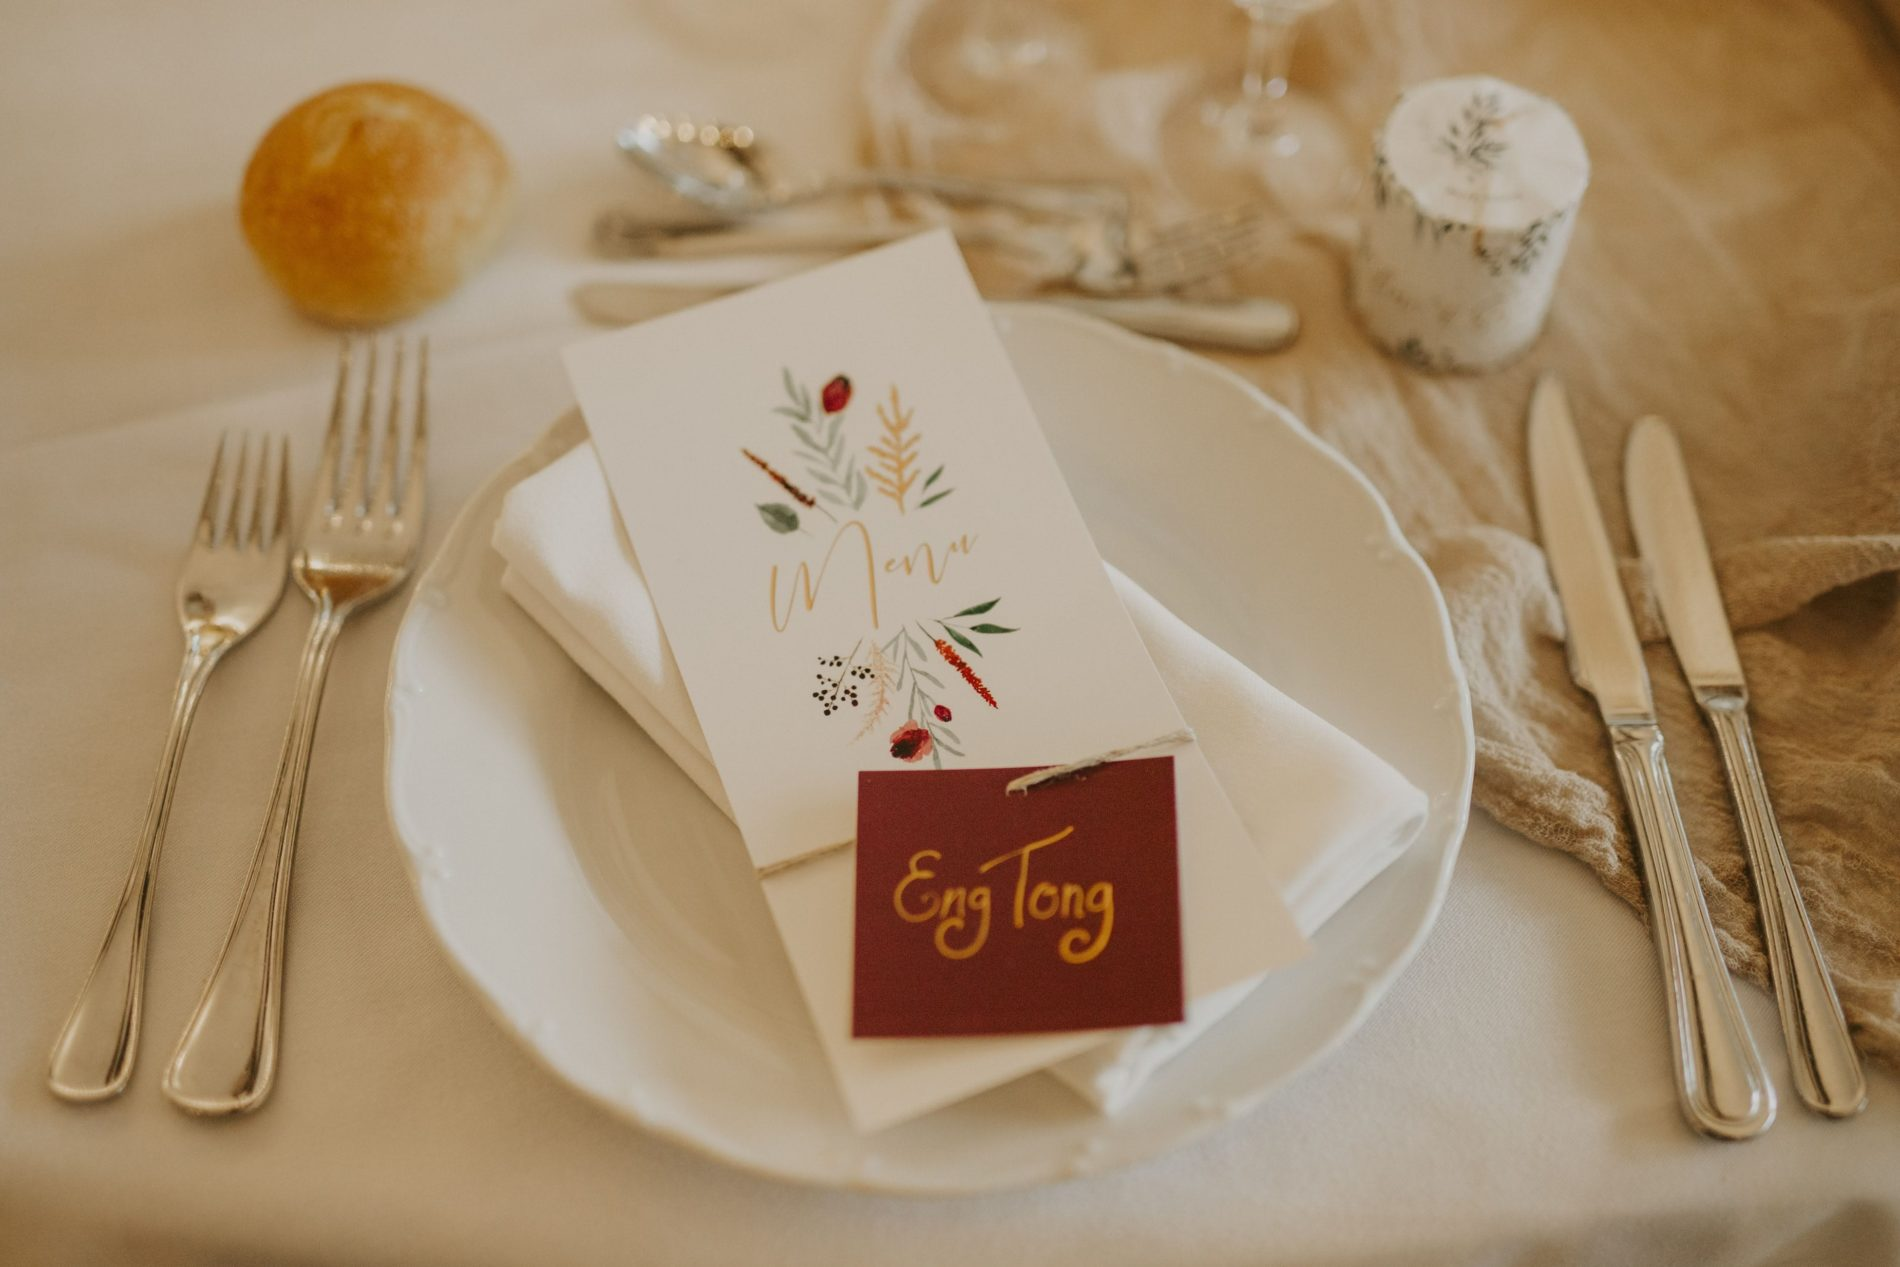 0147_04-CelineSereivuth-149-obonheurdesdames-decoration-mariage-location-Jordane-Chaillou